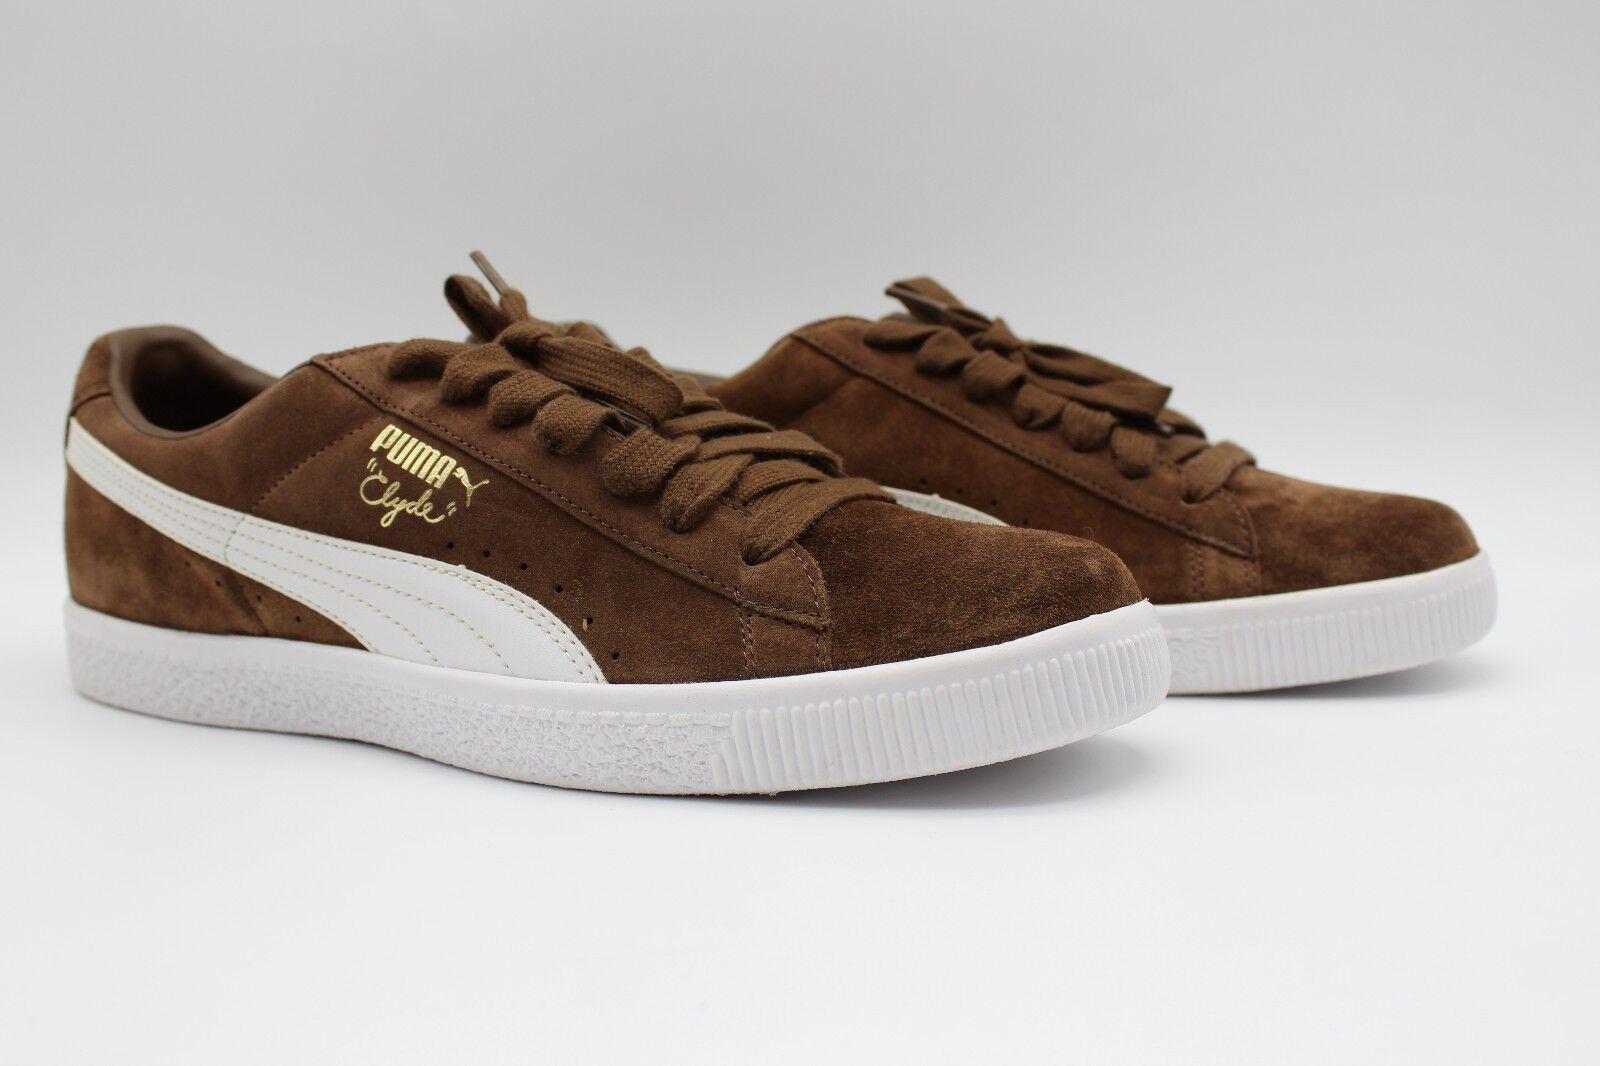 Puma Men's Clyde Script Dark Earth Brown White Sneakers 351907-15 (NEW)